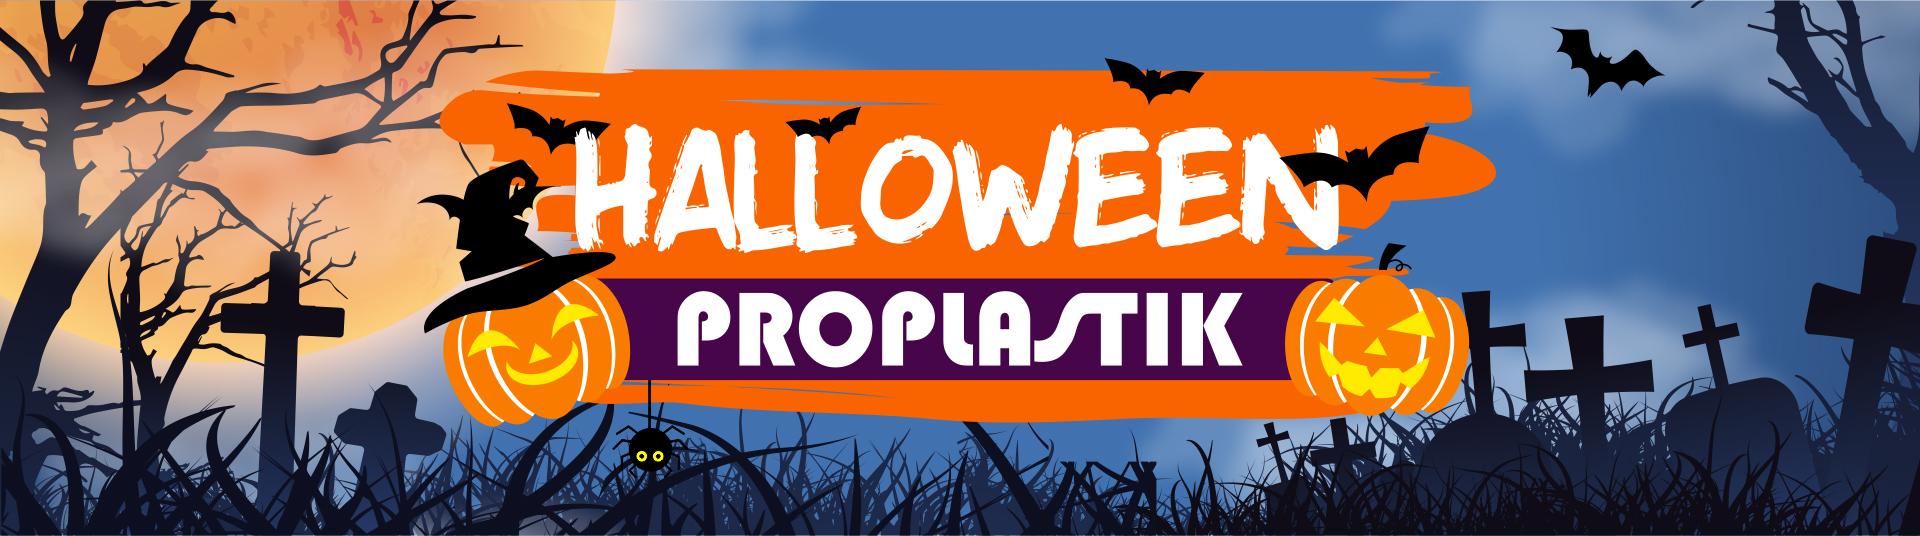 Halloween proplastik